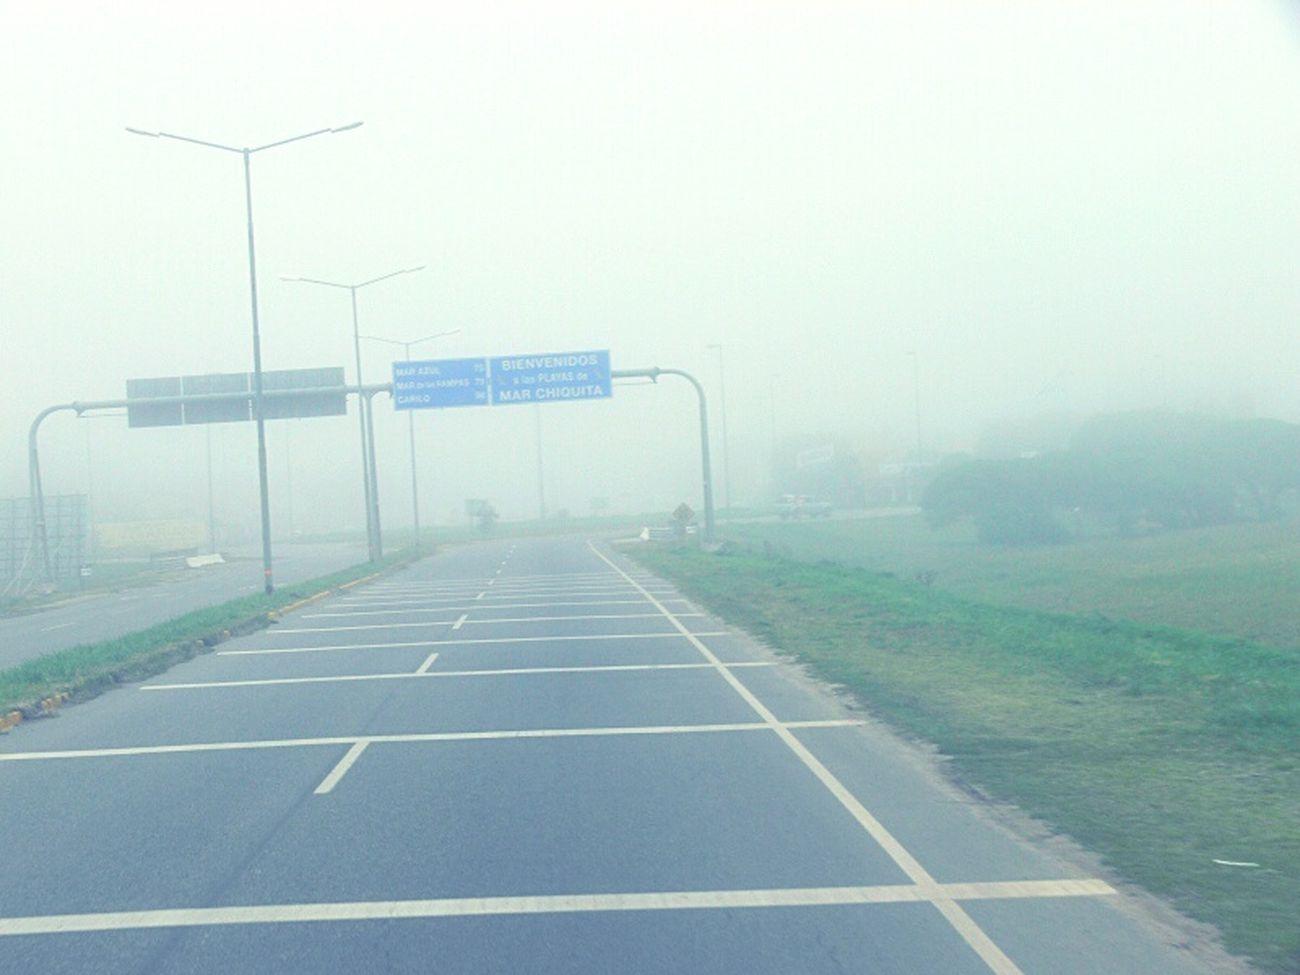 Ruta 9 Maravillosa Neblina peligro Colapso